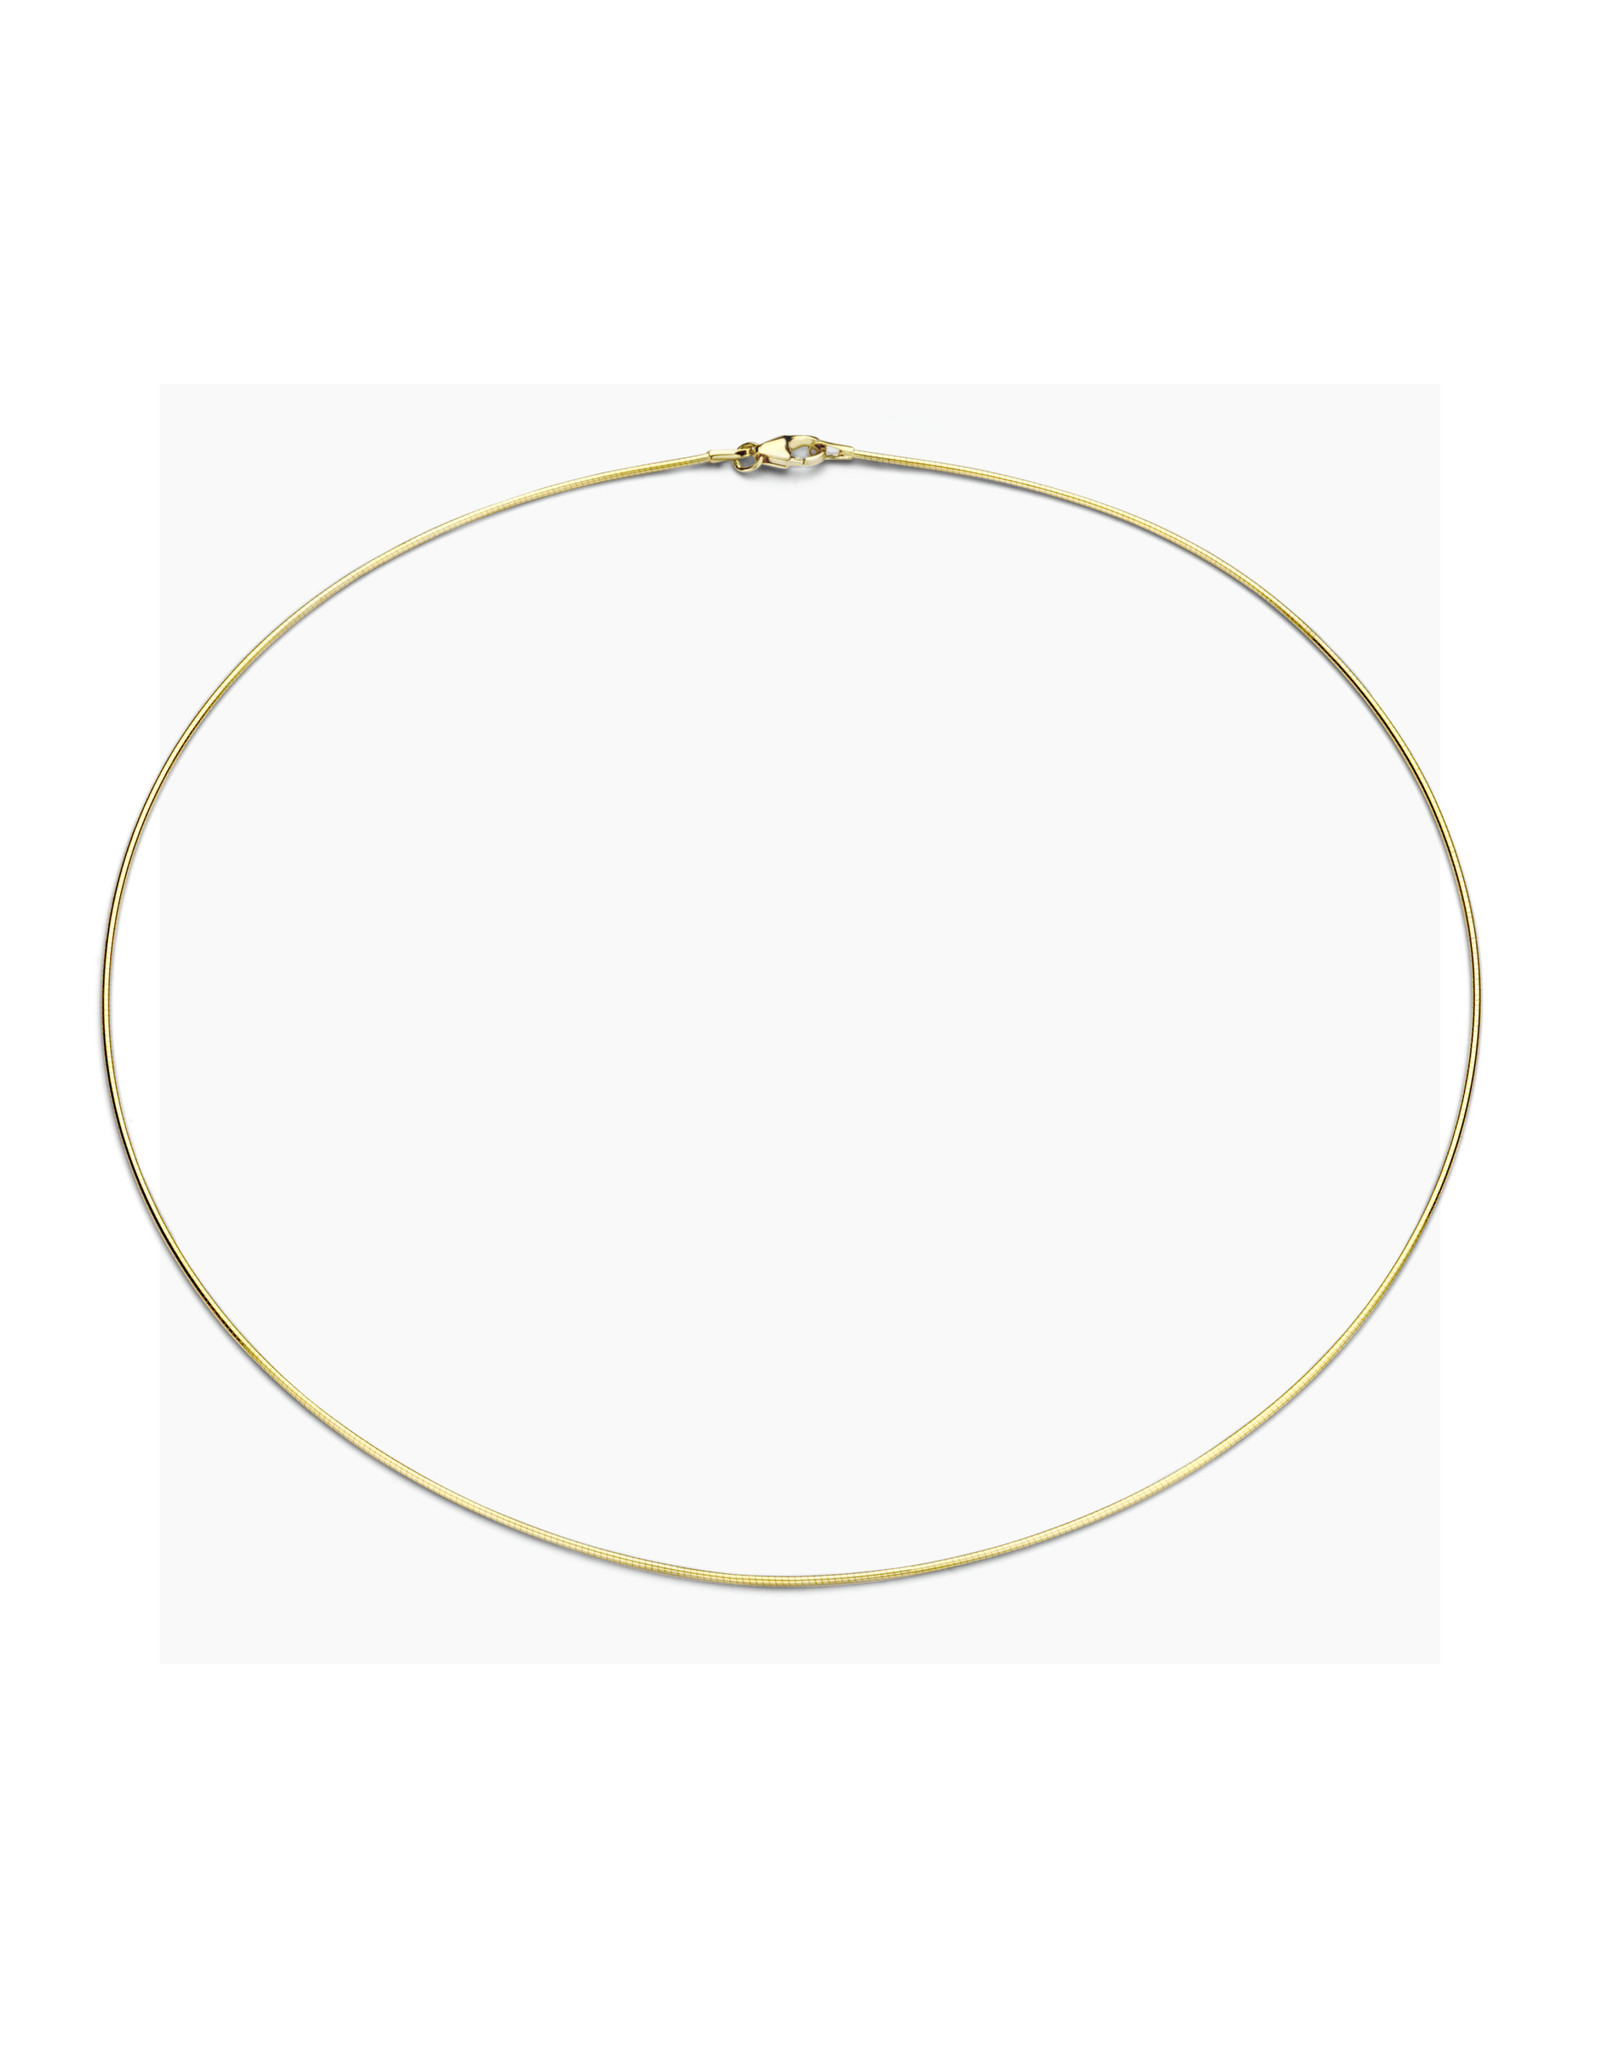 FJF Jewellery Collier FJF Tonda zilver verguld FJF0020145SYG